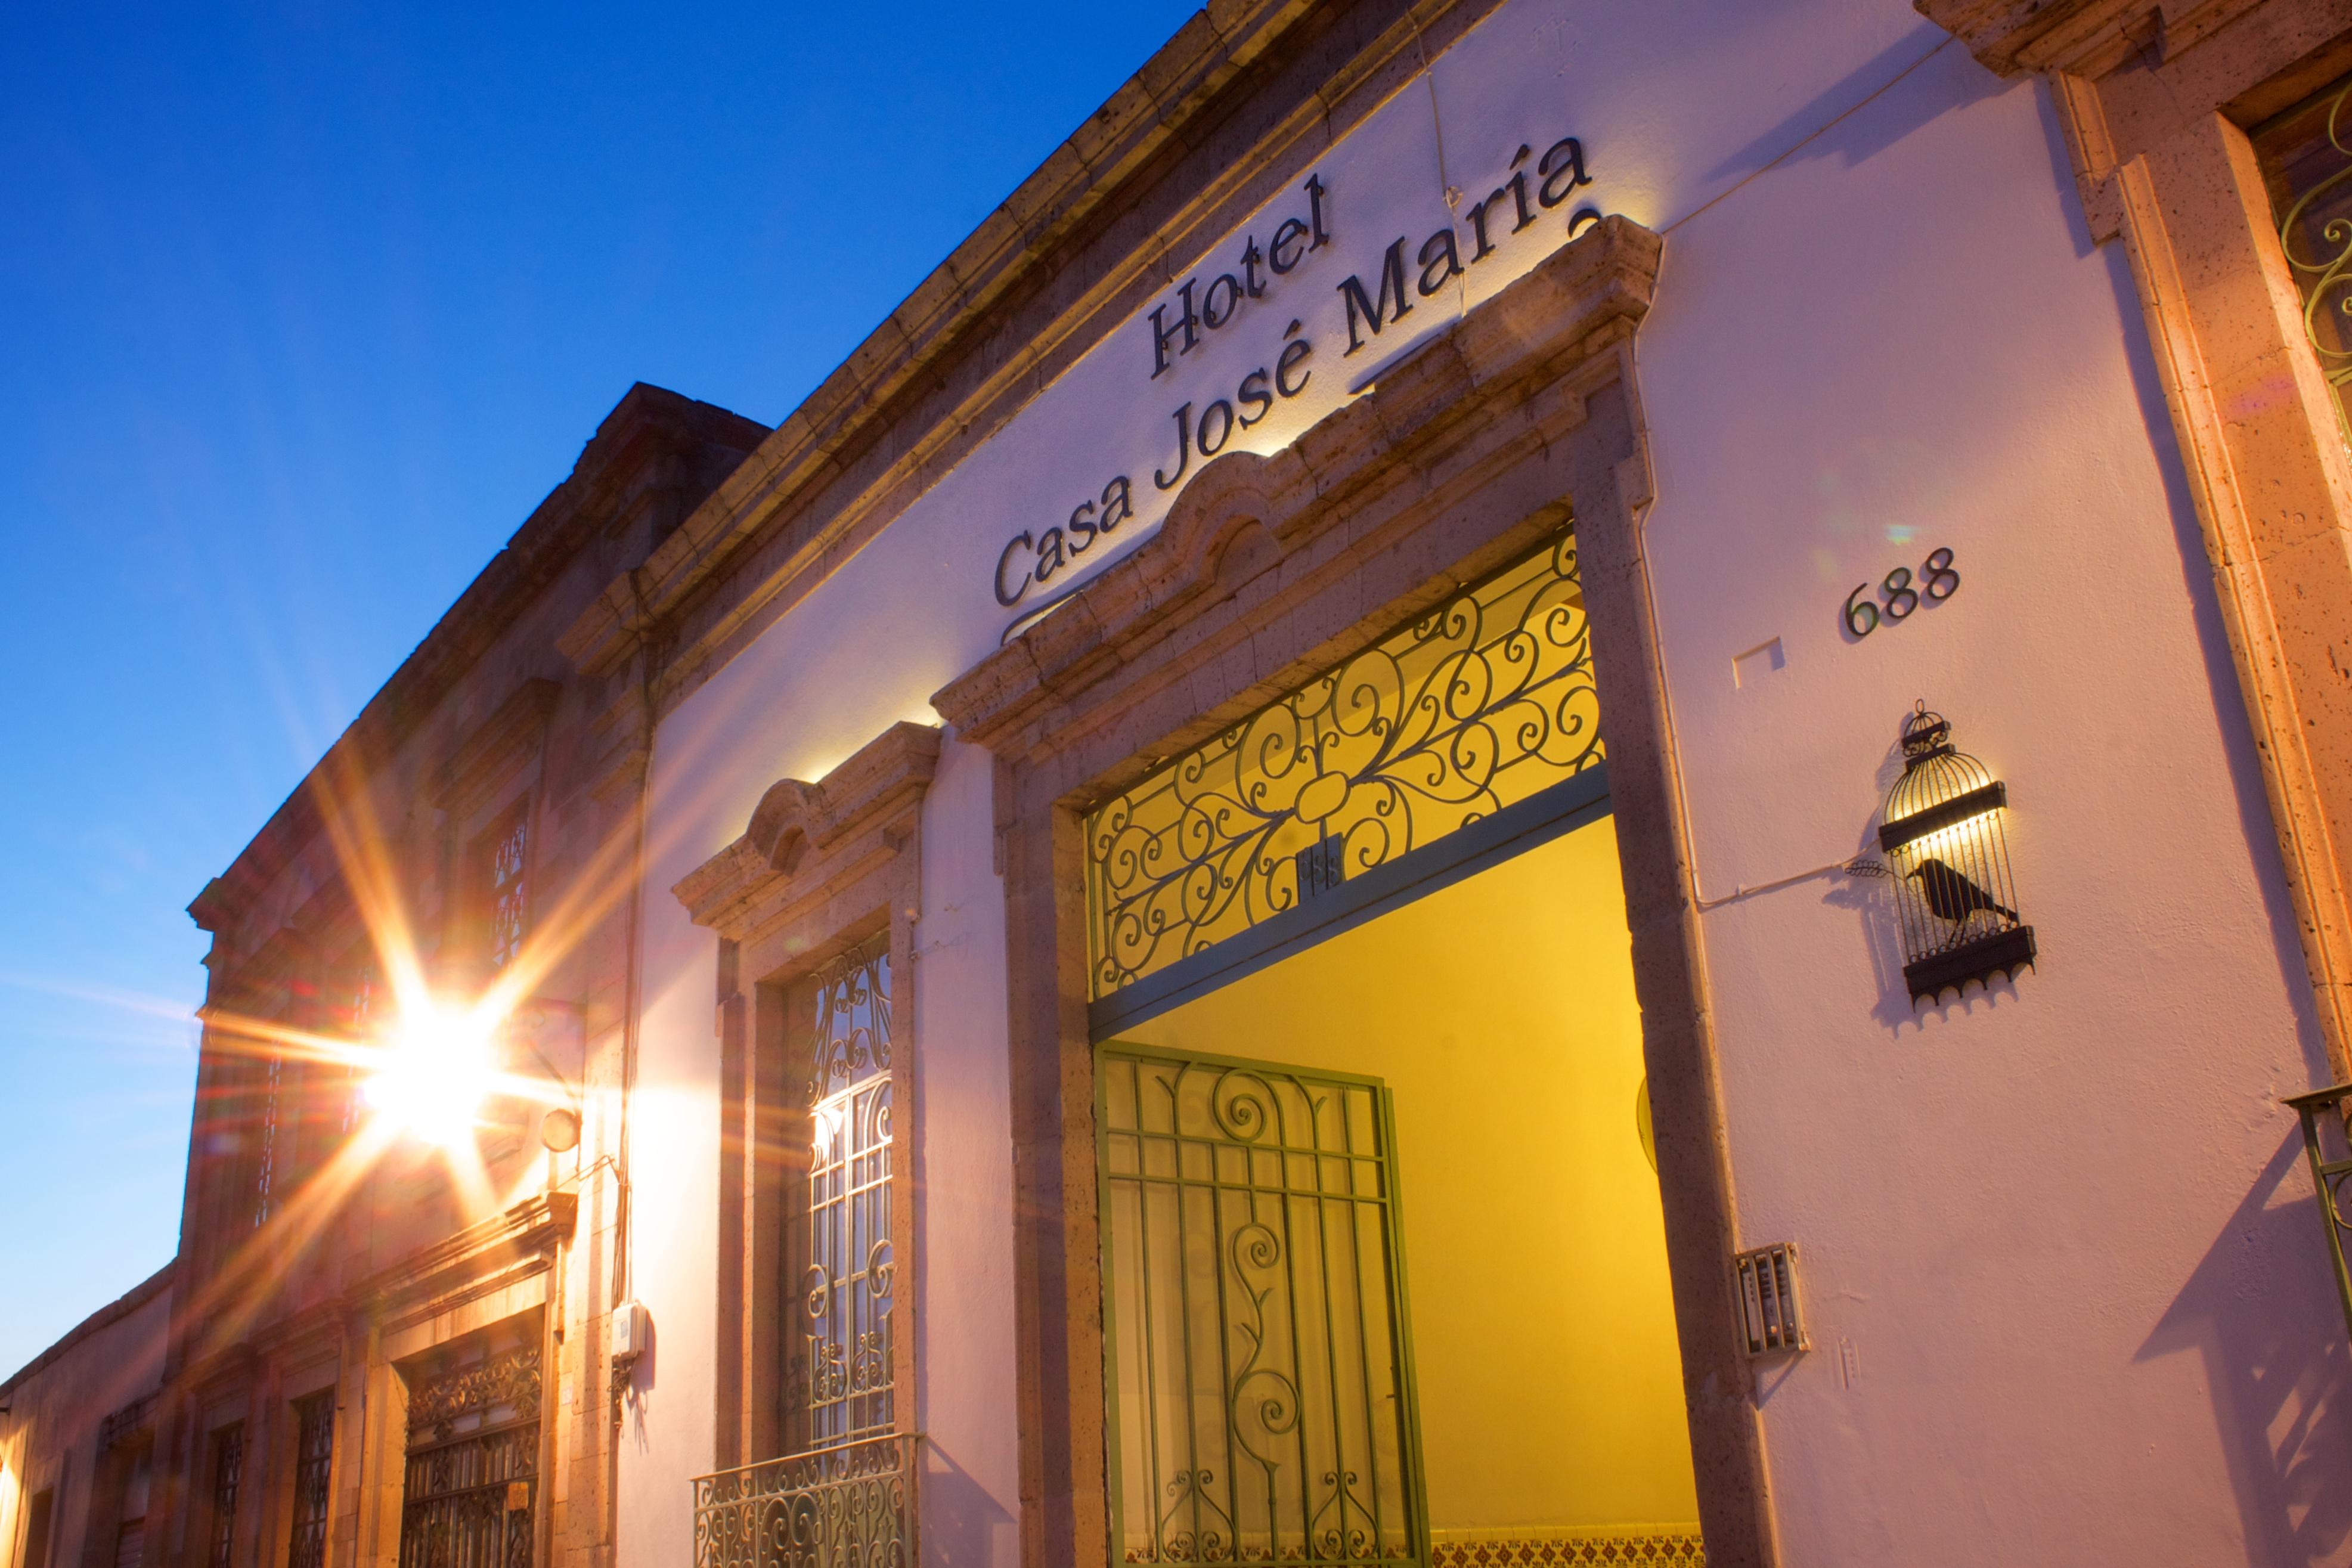 Casa Jose Maria Hotel, Morelia